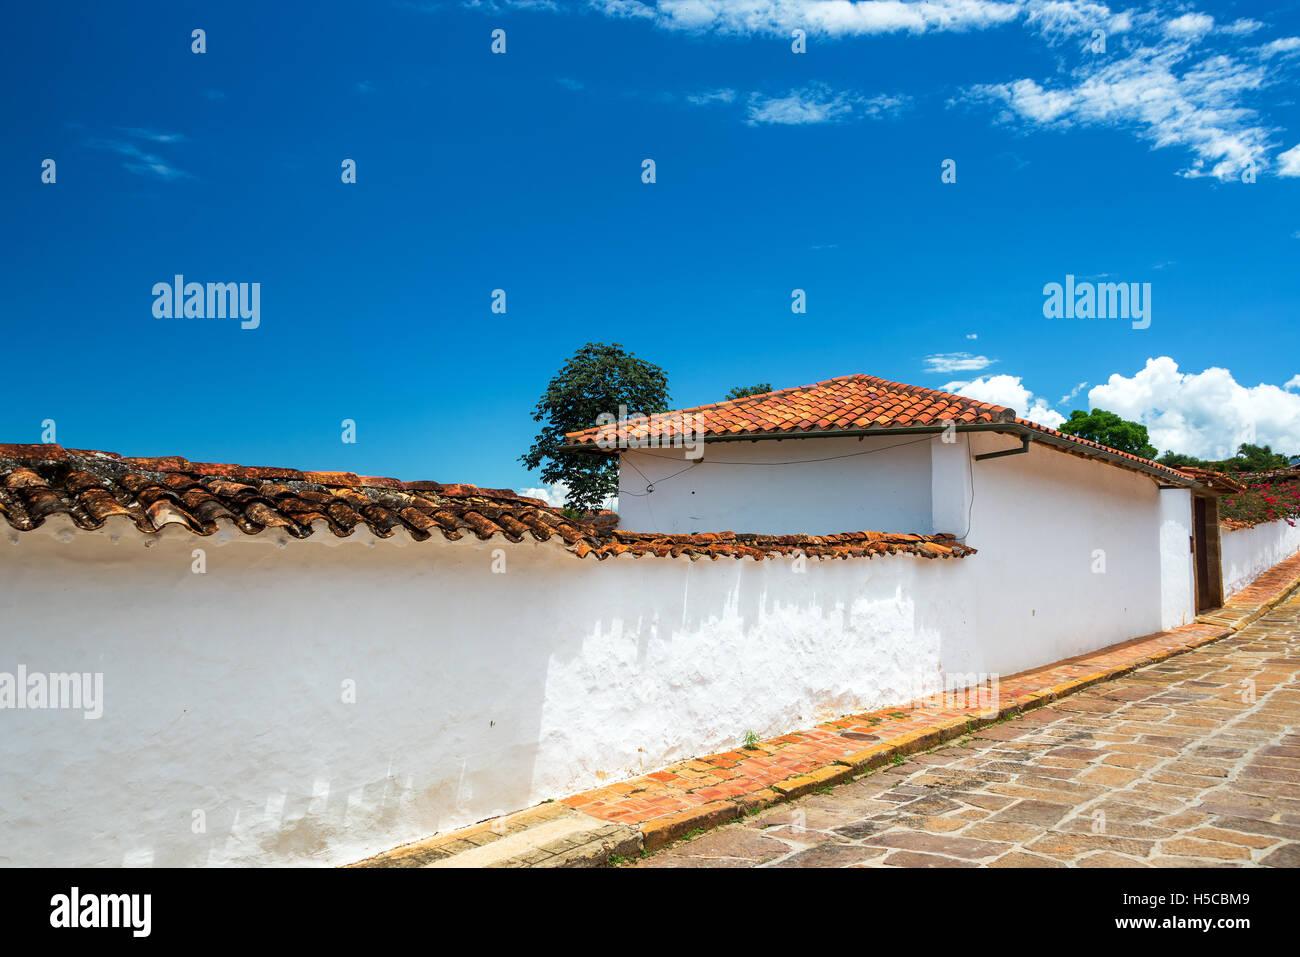 L'architecture coloniale blanche à Barichara, Colombie Photo Stock